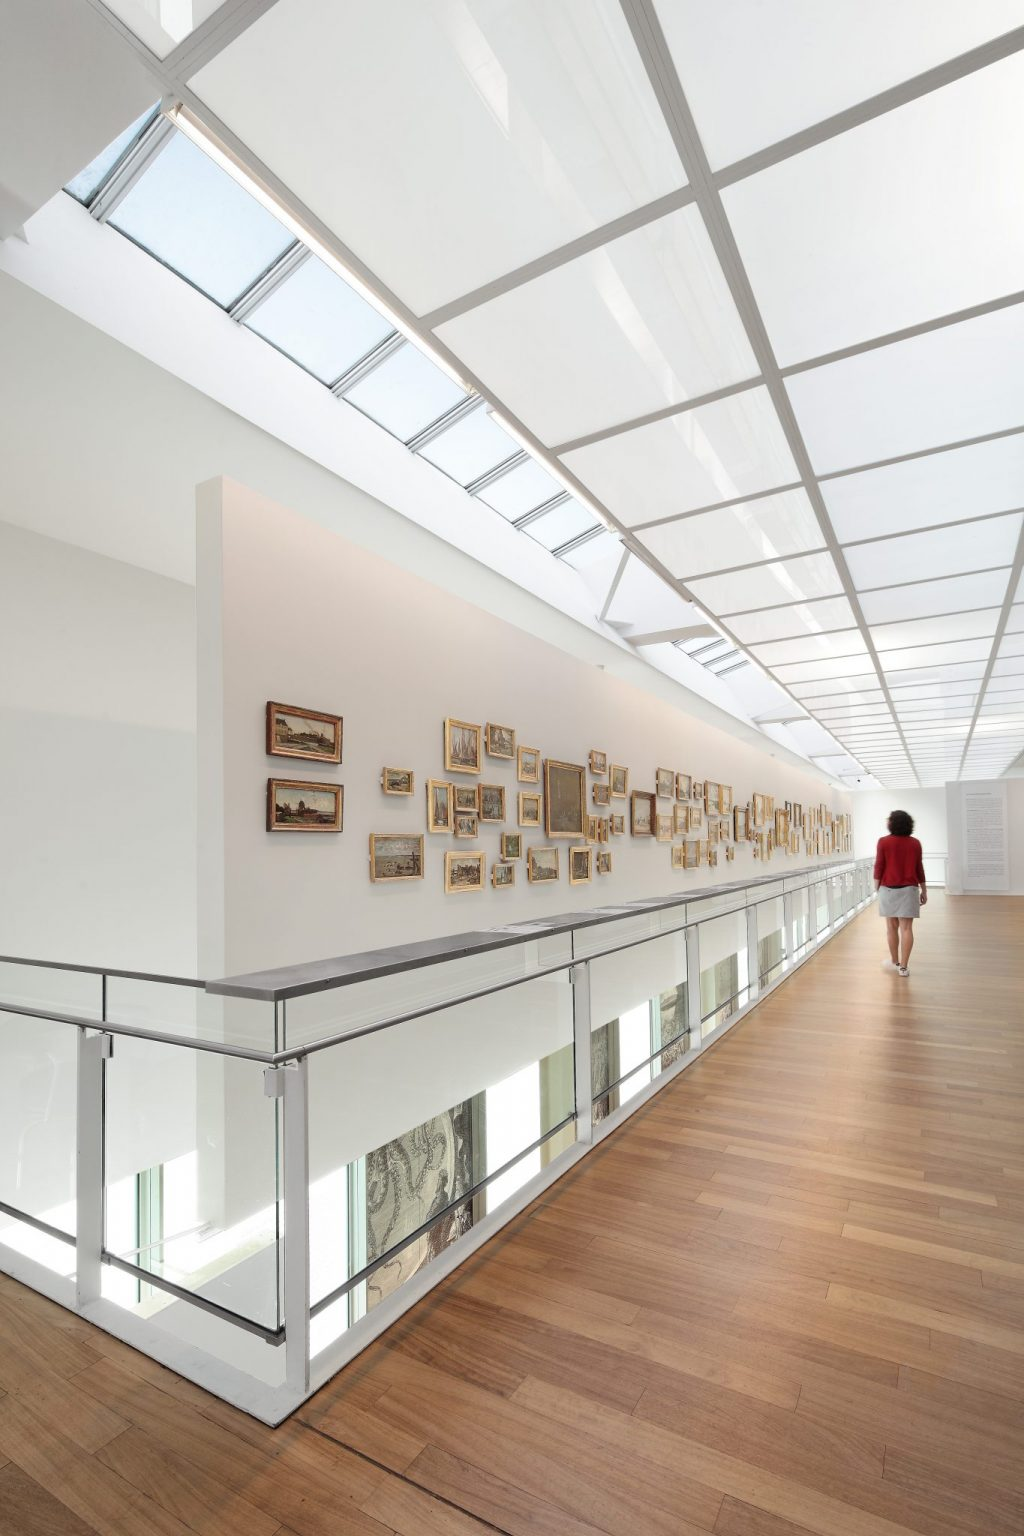 MuMa Musée Malraux